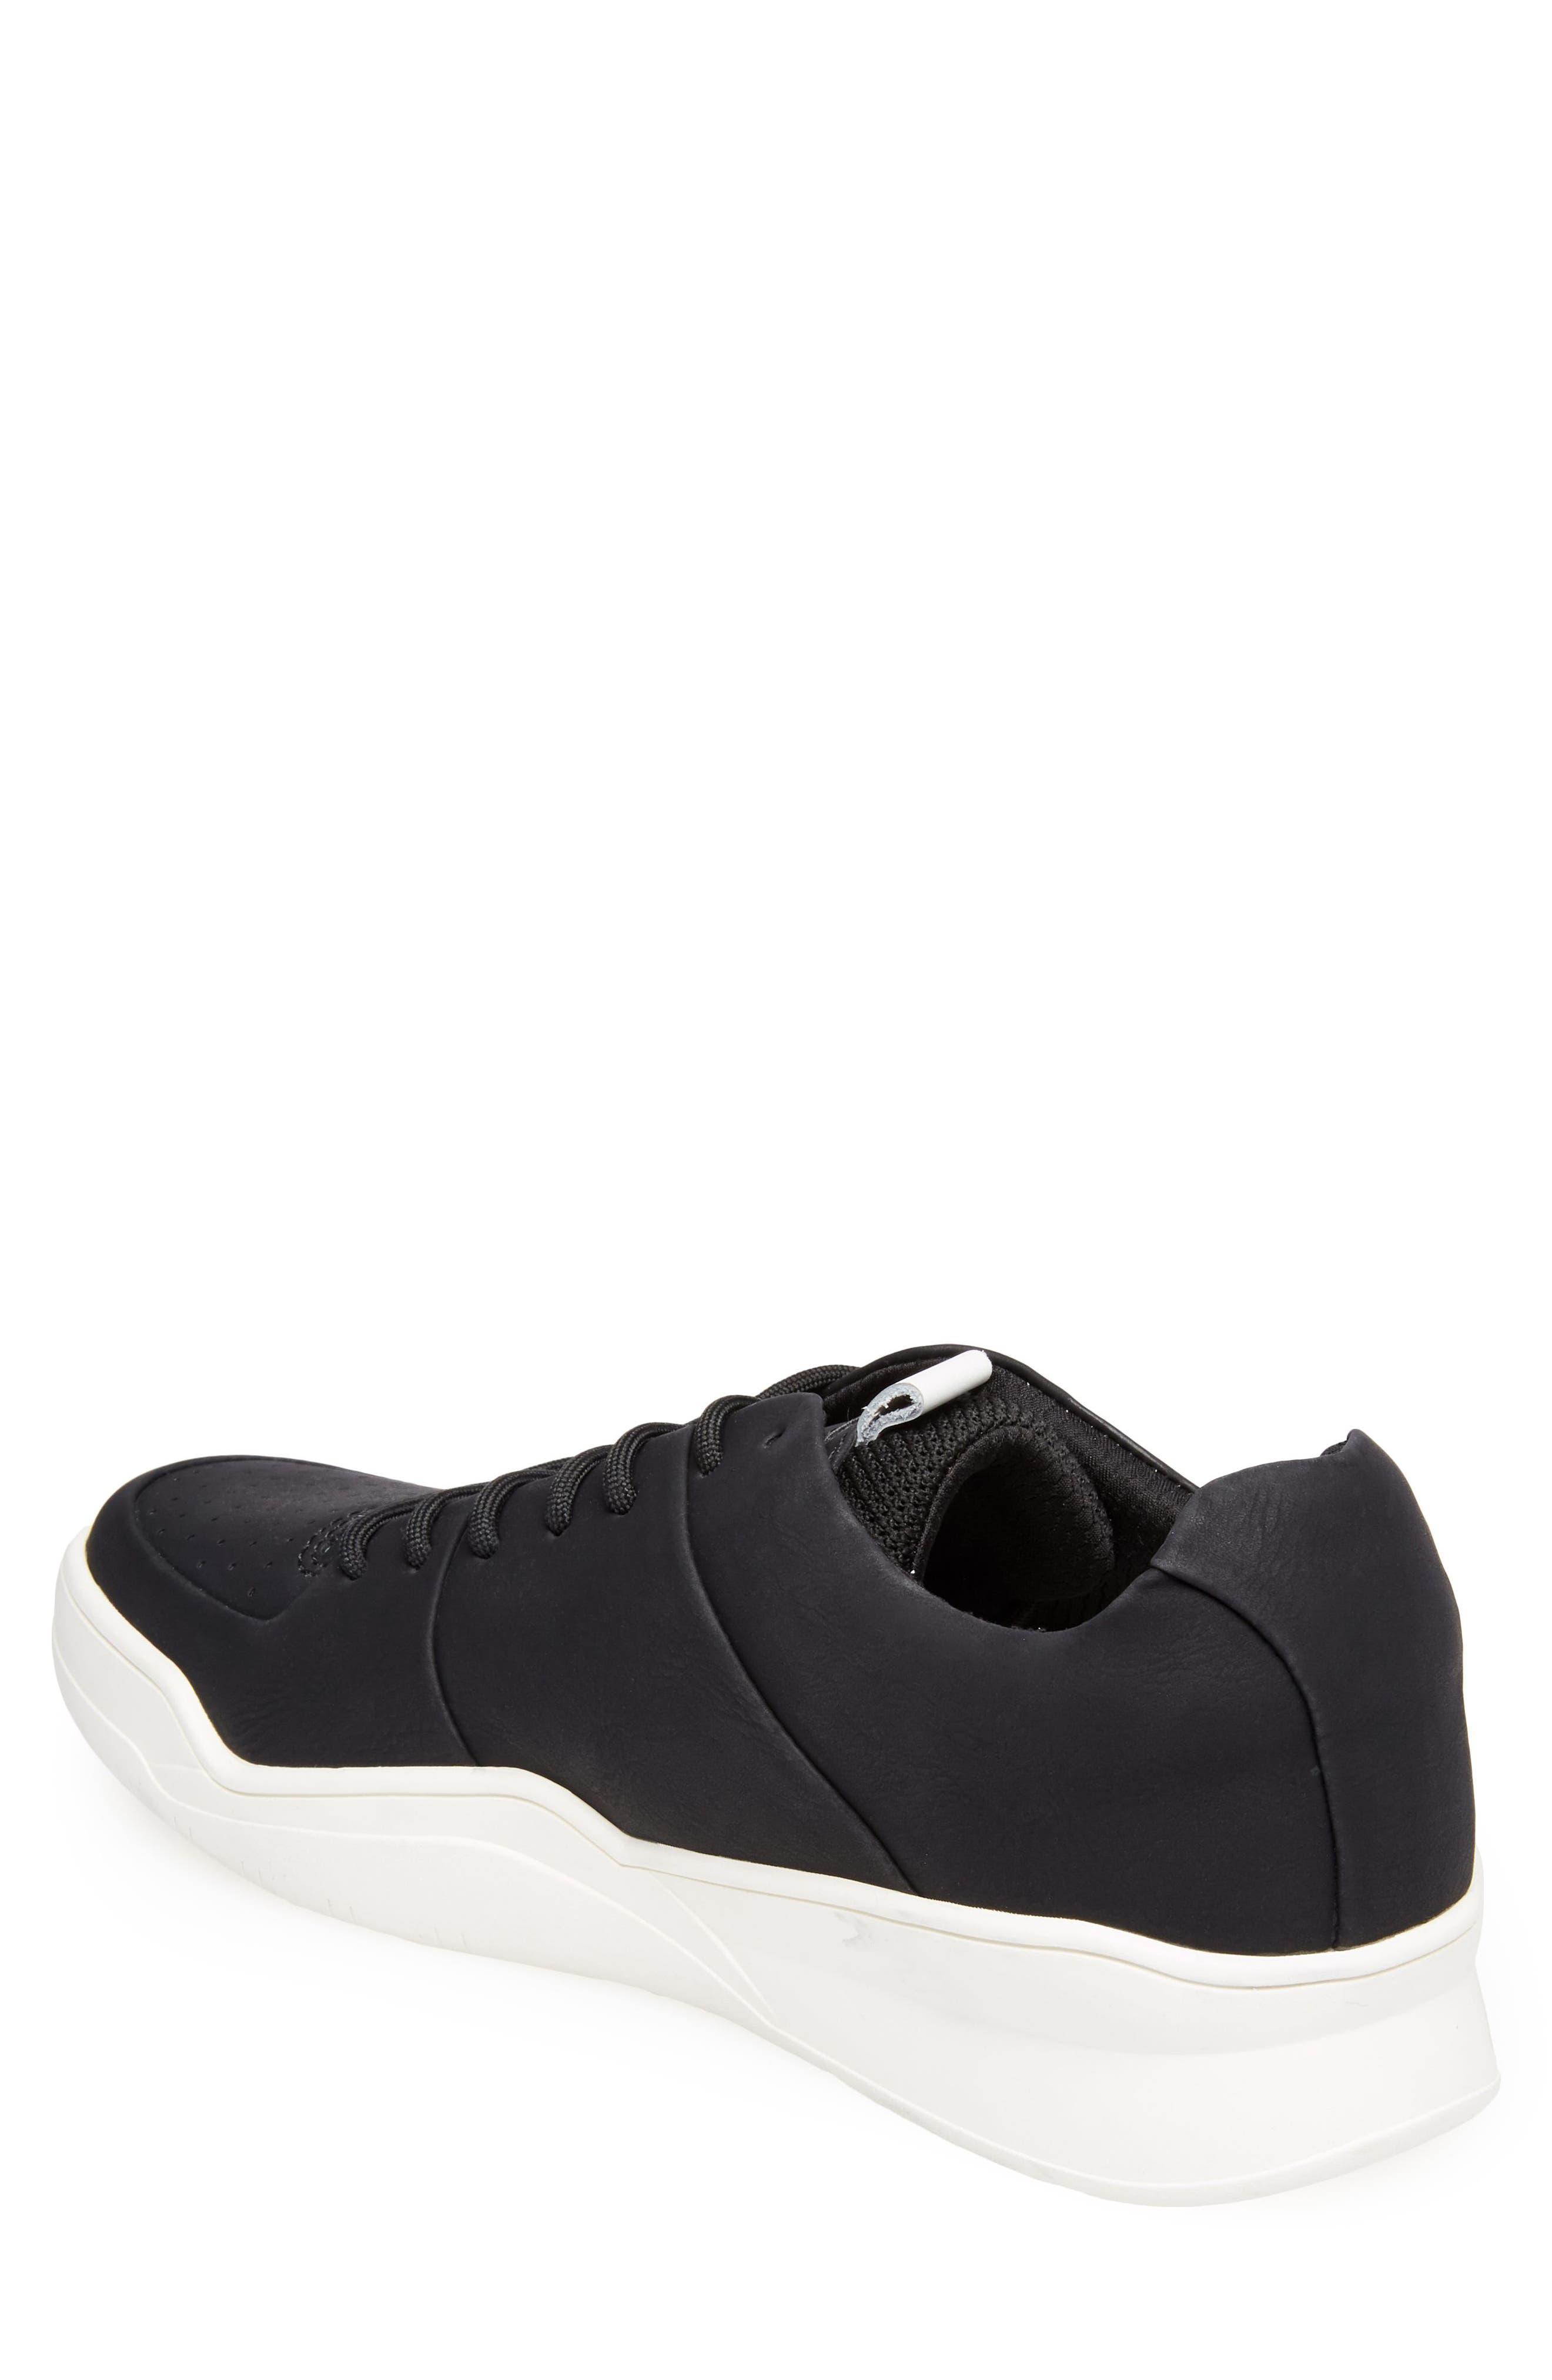 Vantage Sneaker,                             Alternate thumbnail 2, color,                             001